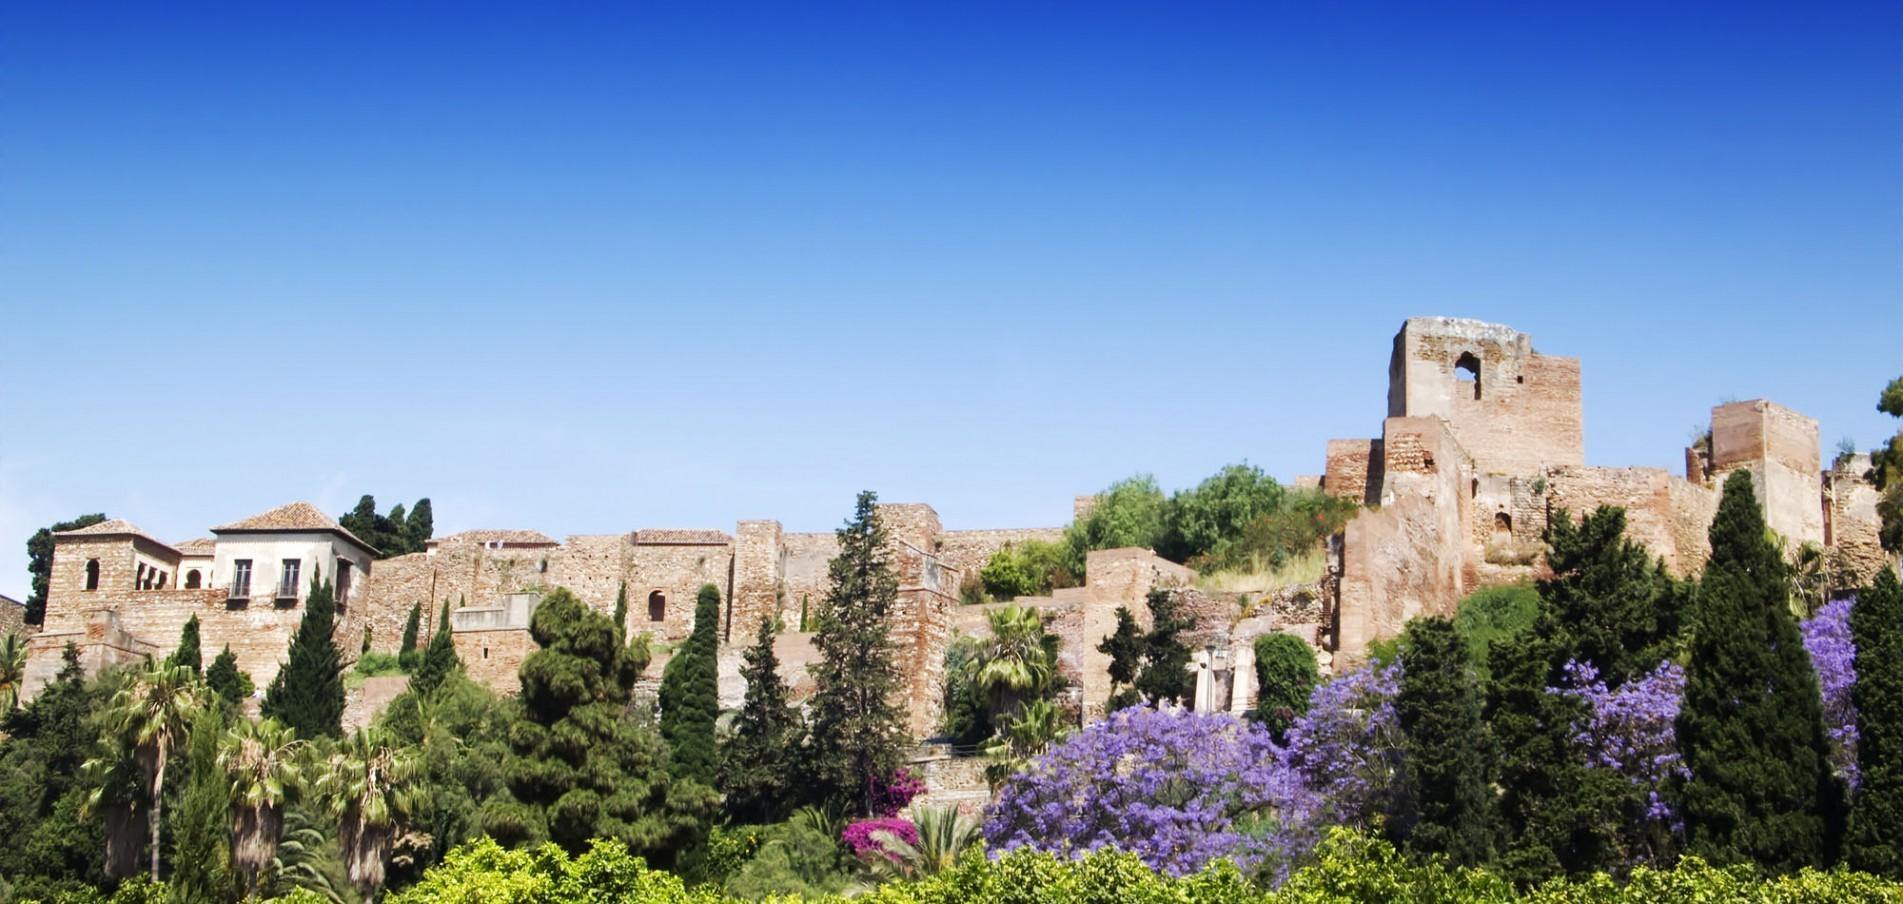 LA ALCAZABA ... Malagas imposante Festung!